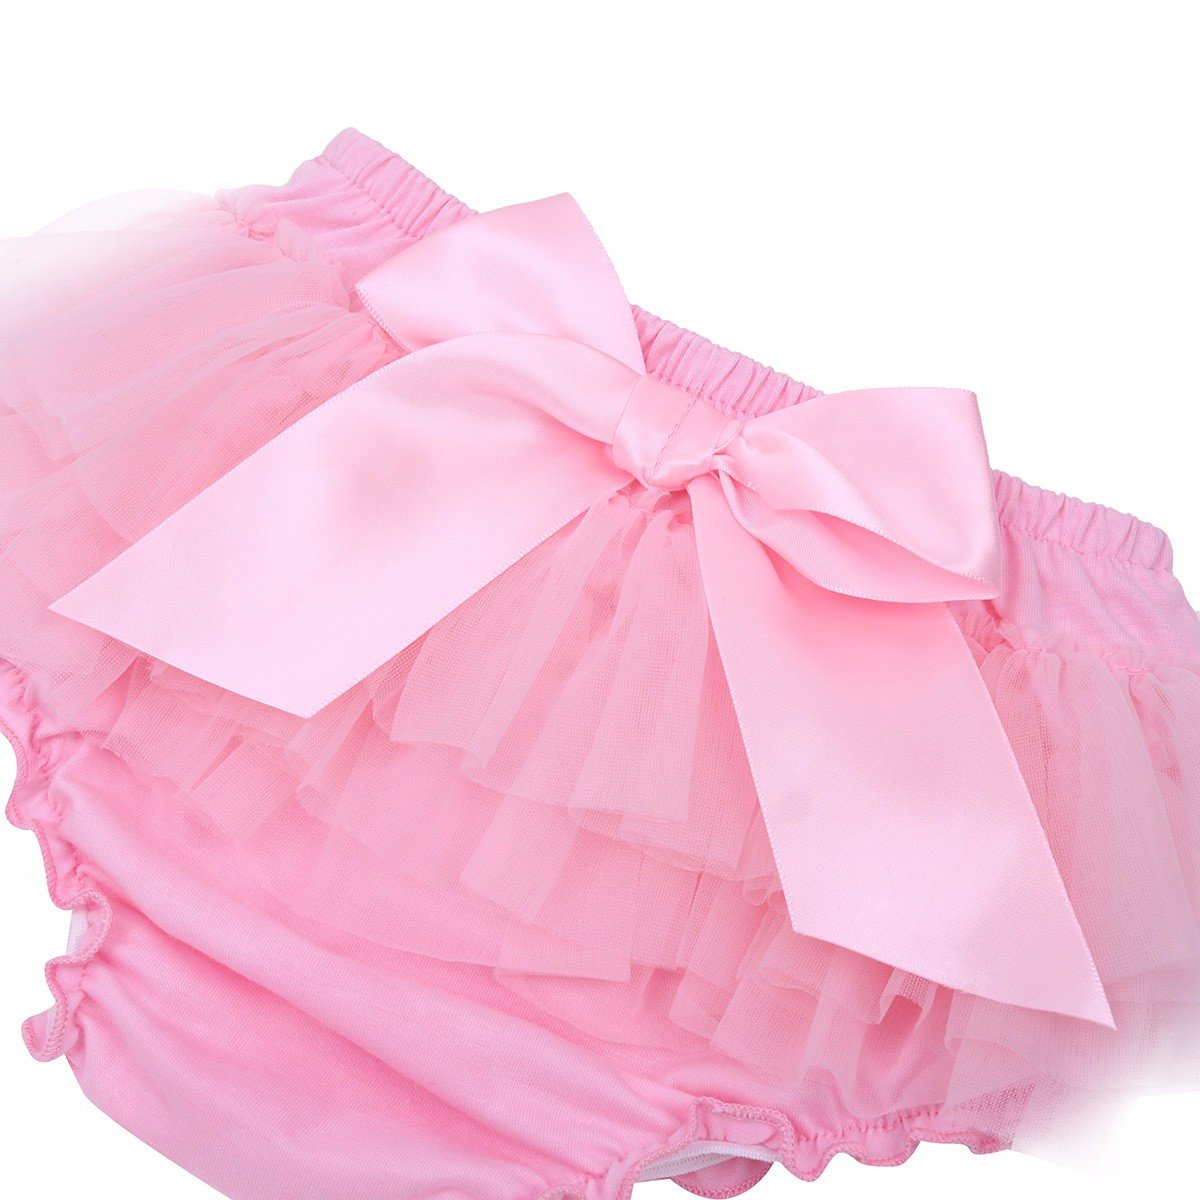 UCQueen 2PC Rompers for Girls Newborn Girl Ruffles Floral Print Romper Jumpsuit Sunsuit Bodysuit Headband Clothes Set